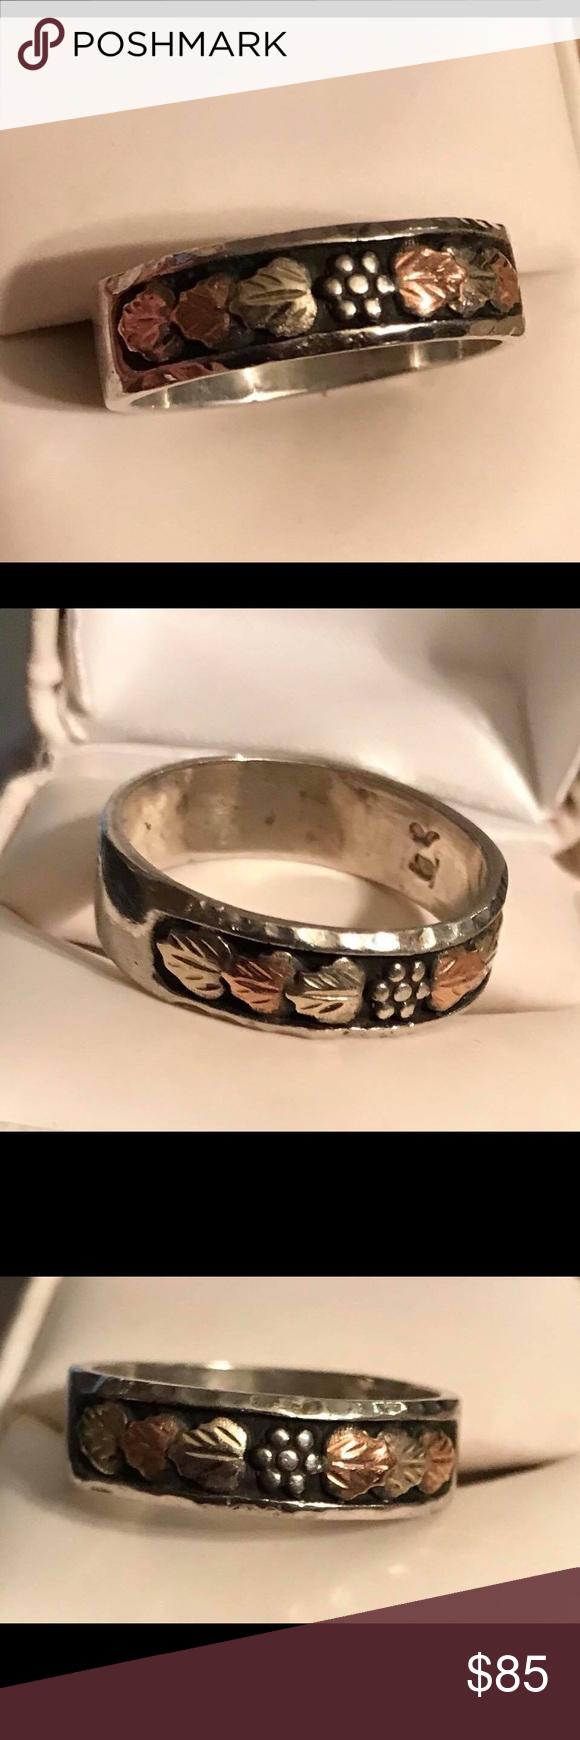 Sterling Silver Land Storm's Black Hills Gold Ring